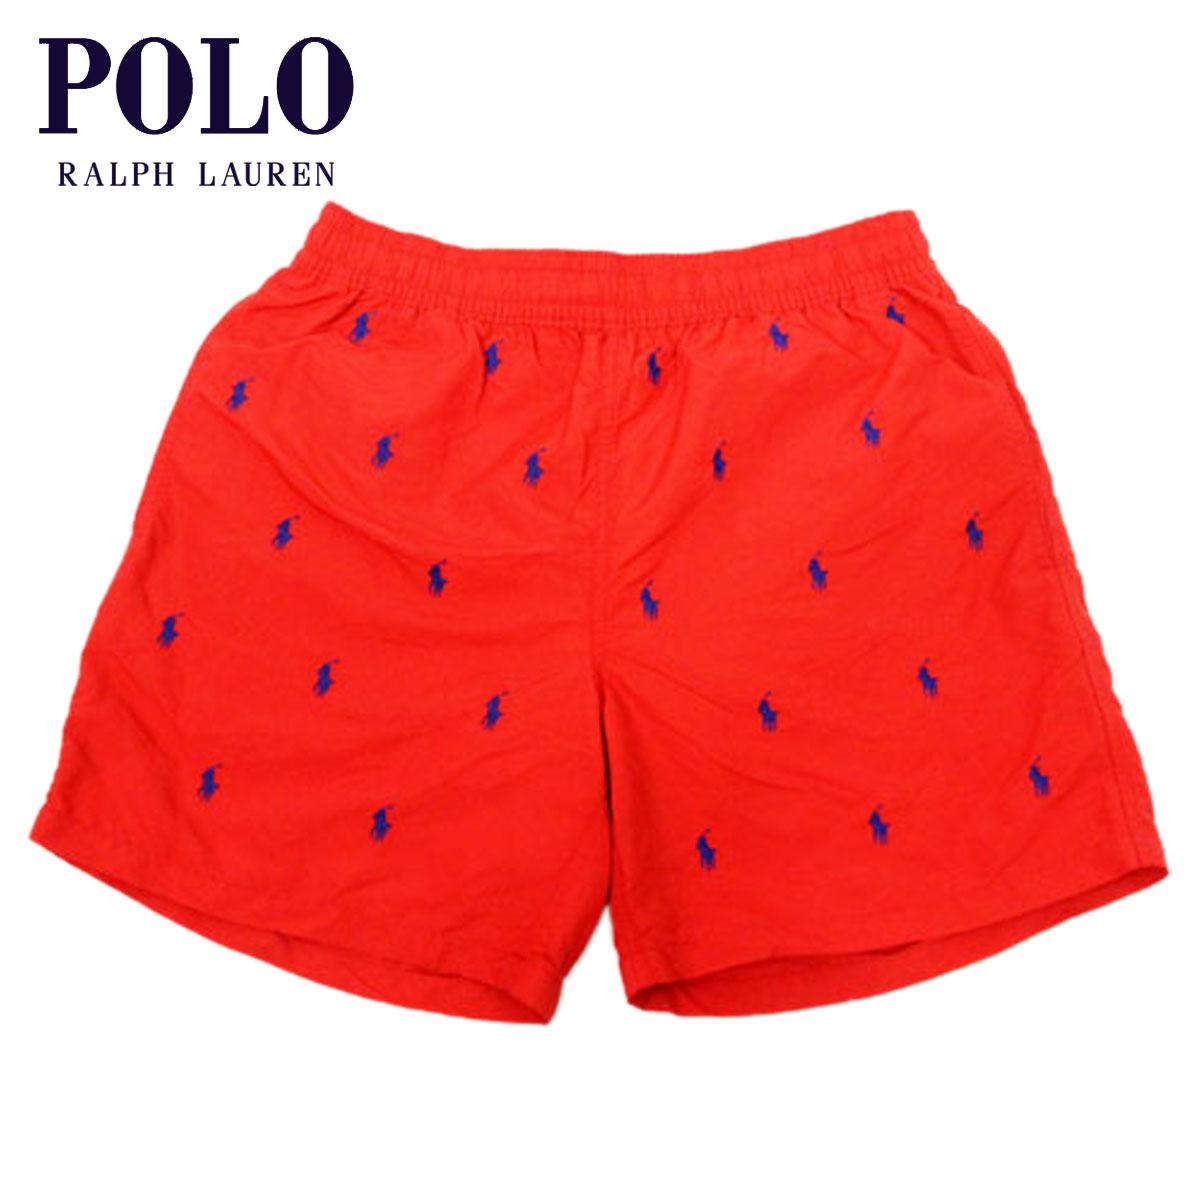 e471a9fd8 30%OFF sale polo Ralph Lauren POLO RALPH LAUREN regular article men  swimming underwear PONY ...